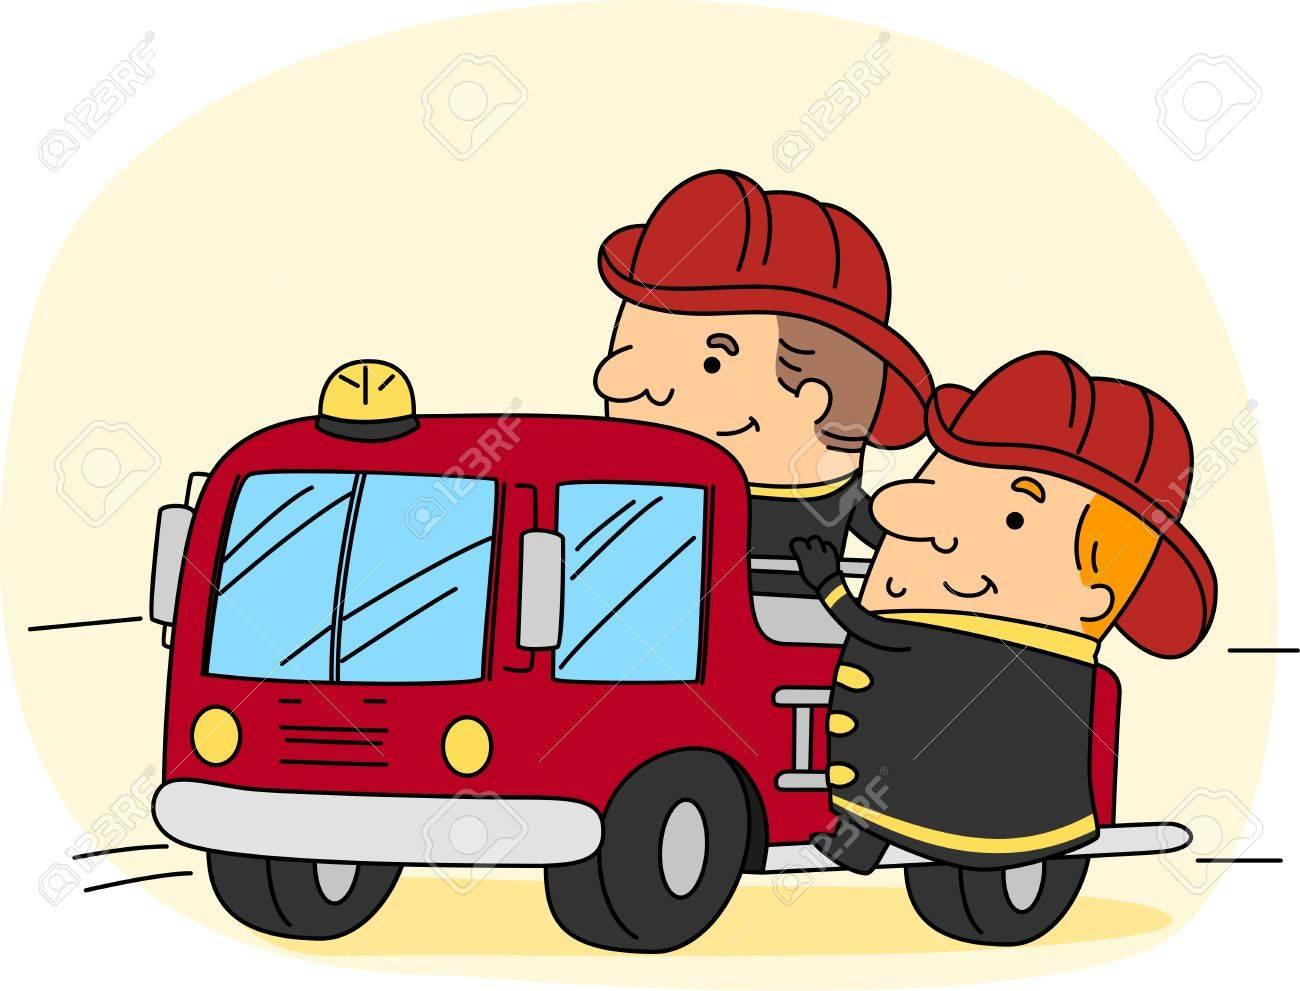 Illustration of a Fireman at Work Stock Illustration - 9456847